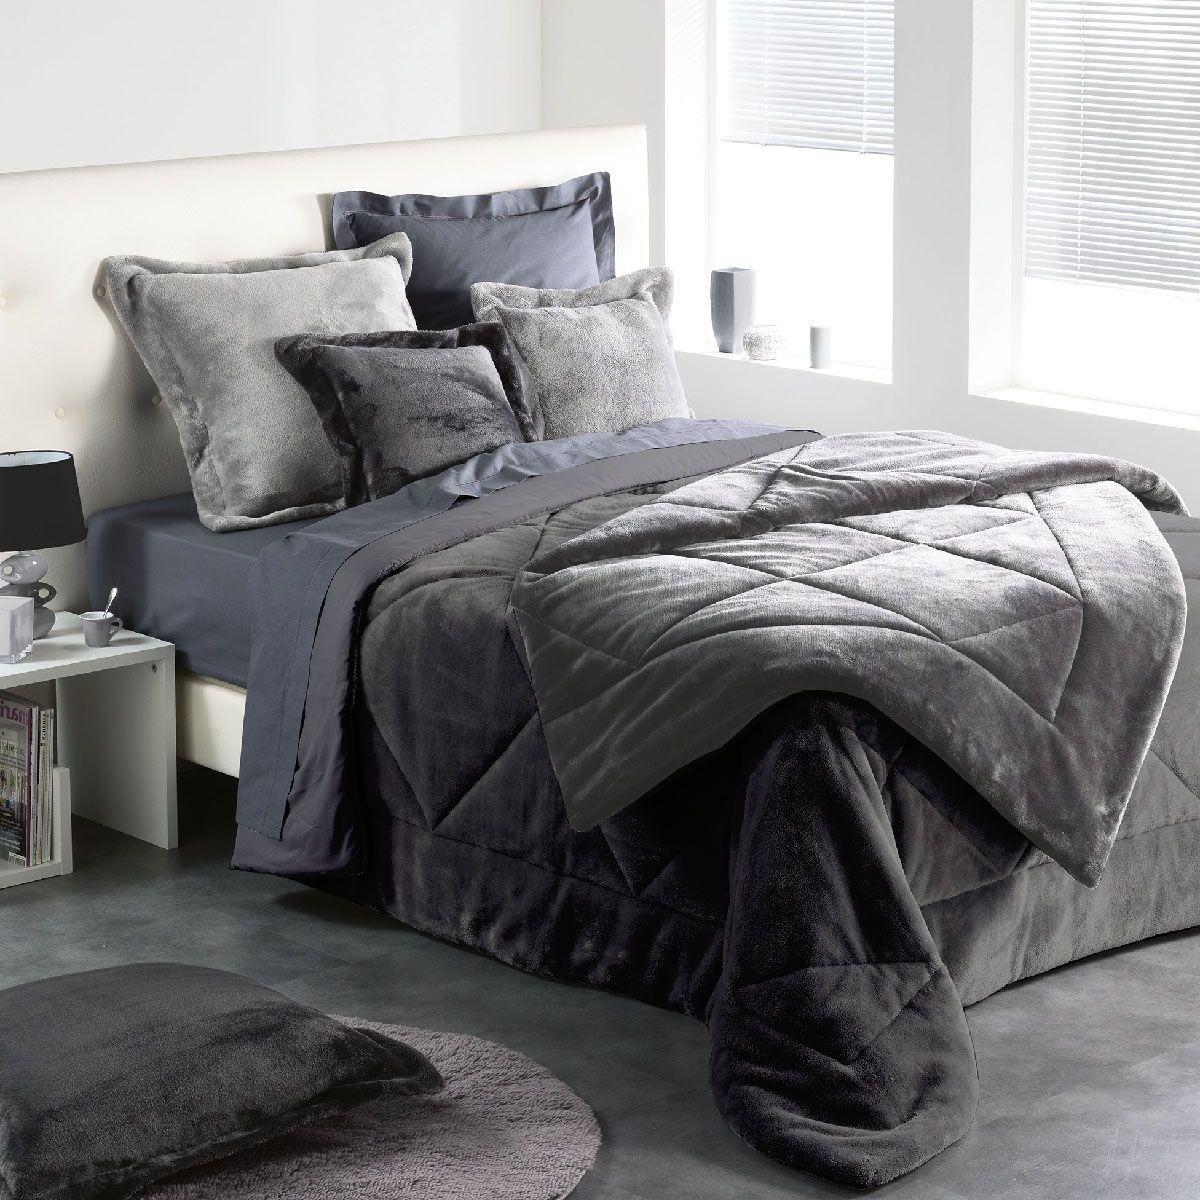 couvre lit 220 x 240 cm sweet night anthracite couvre lit boutis eminza. Black Bedroom Furniture Sets. Home Design Ideas